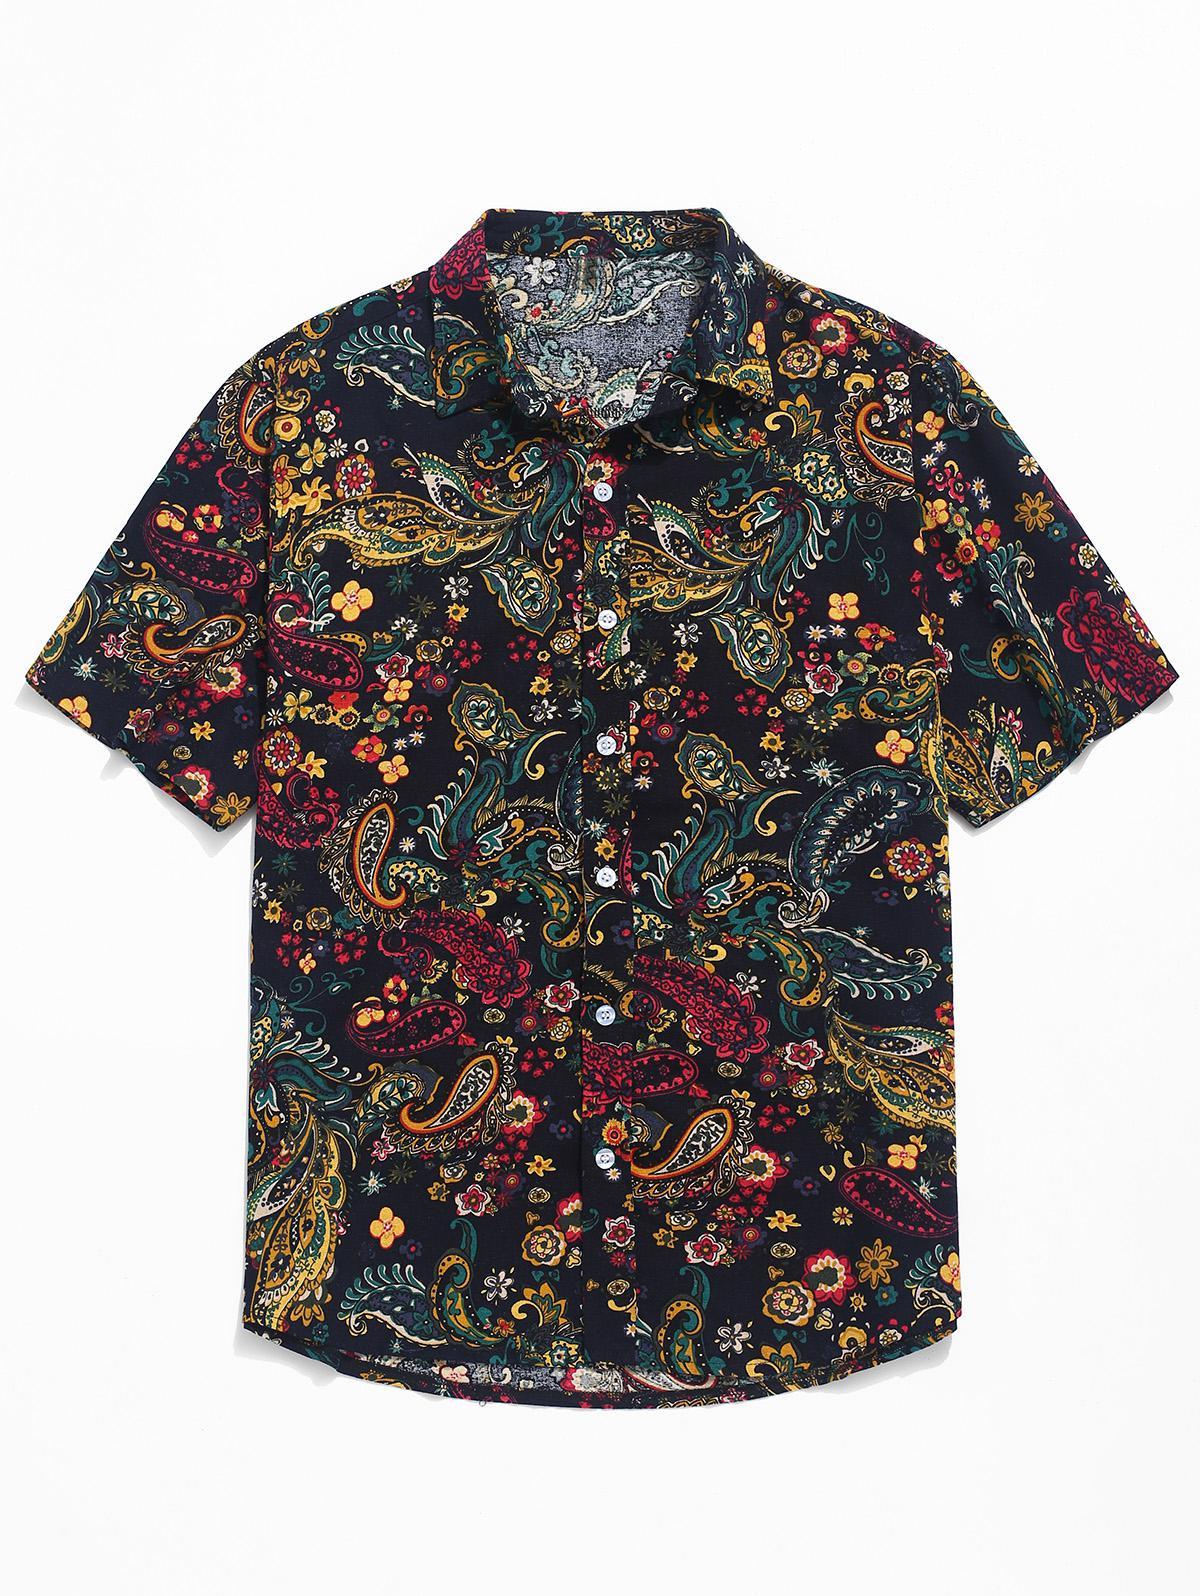 Paisley Print Short Sleeve Shirt, Black